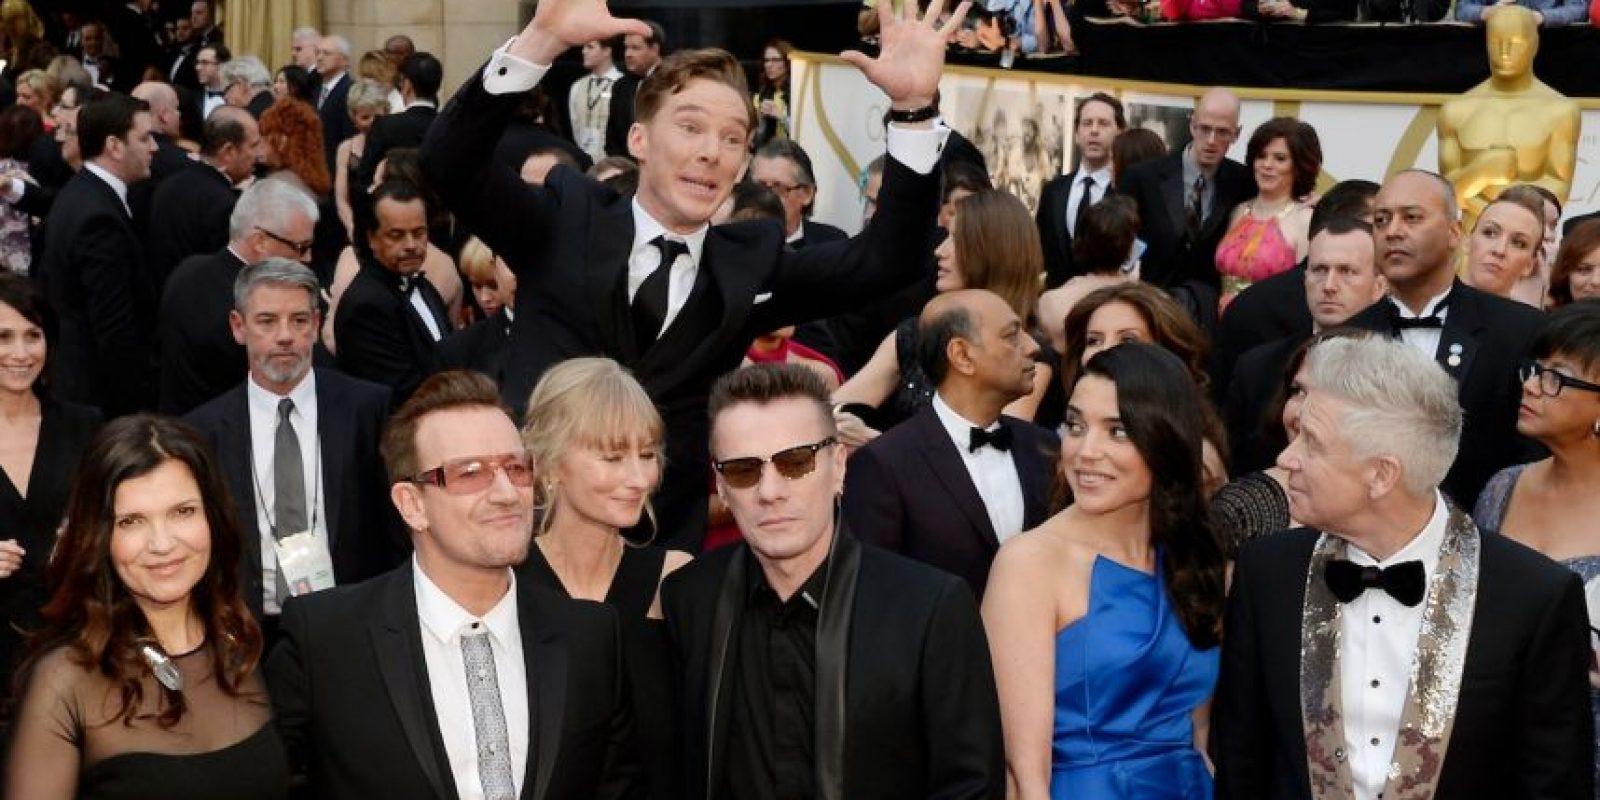 Benedict Cumberbatch opacando a este grupo de estrellas Foto:Getty Images